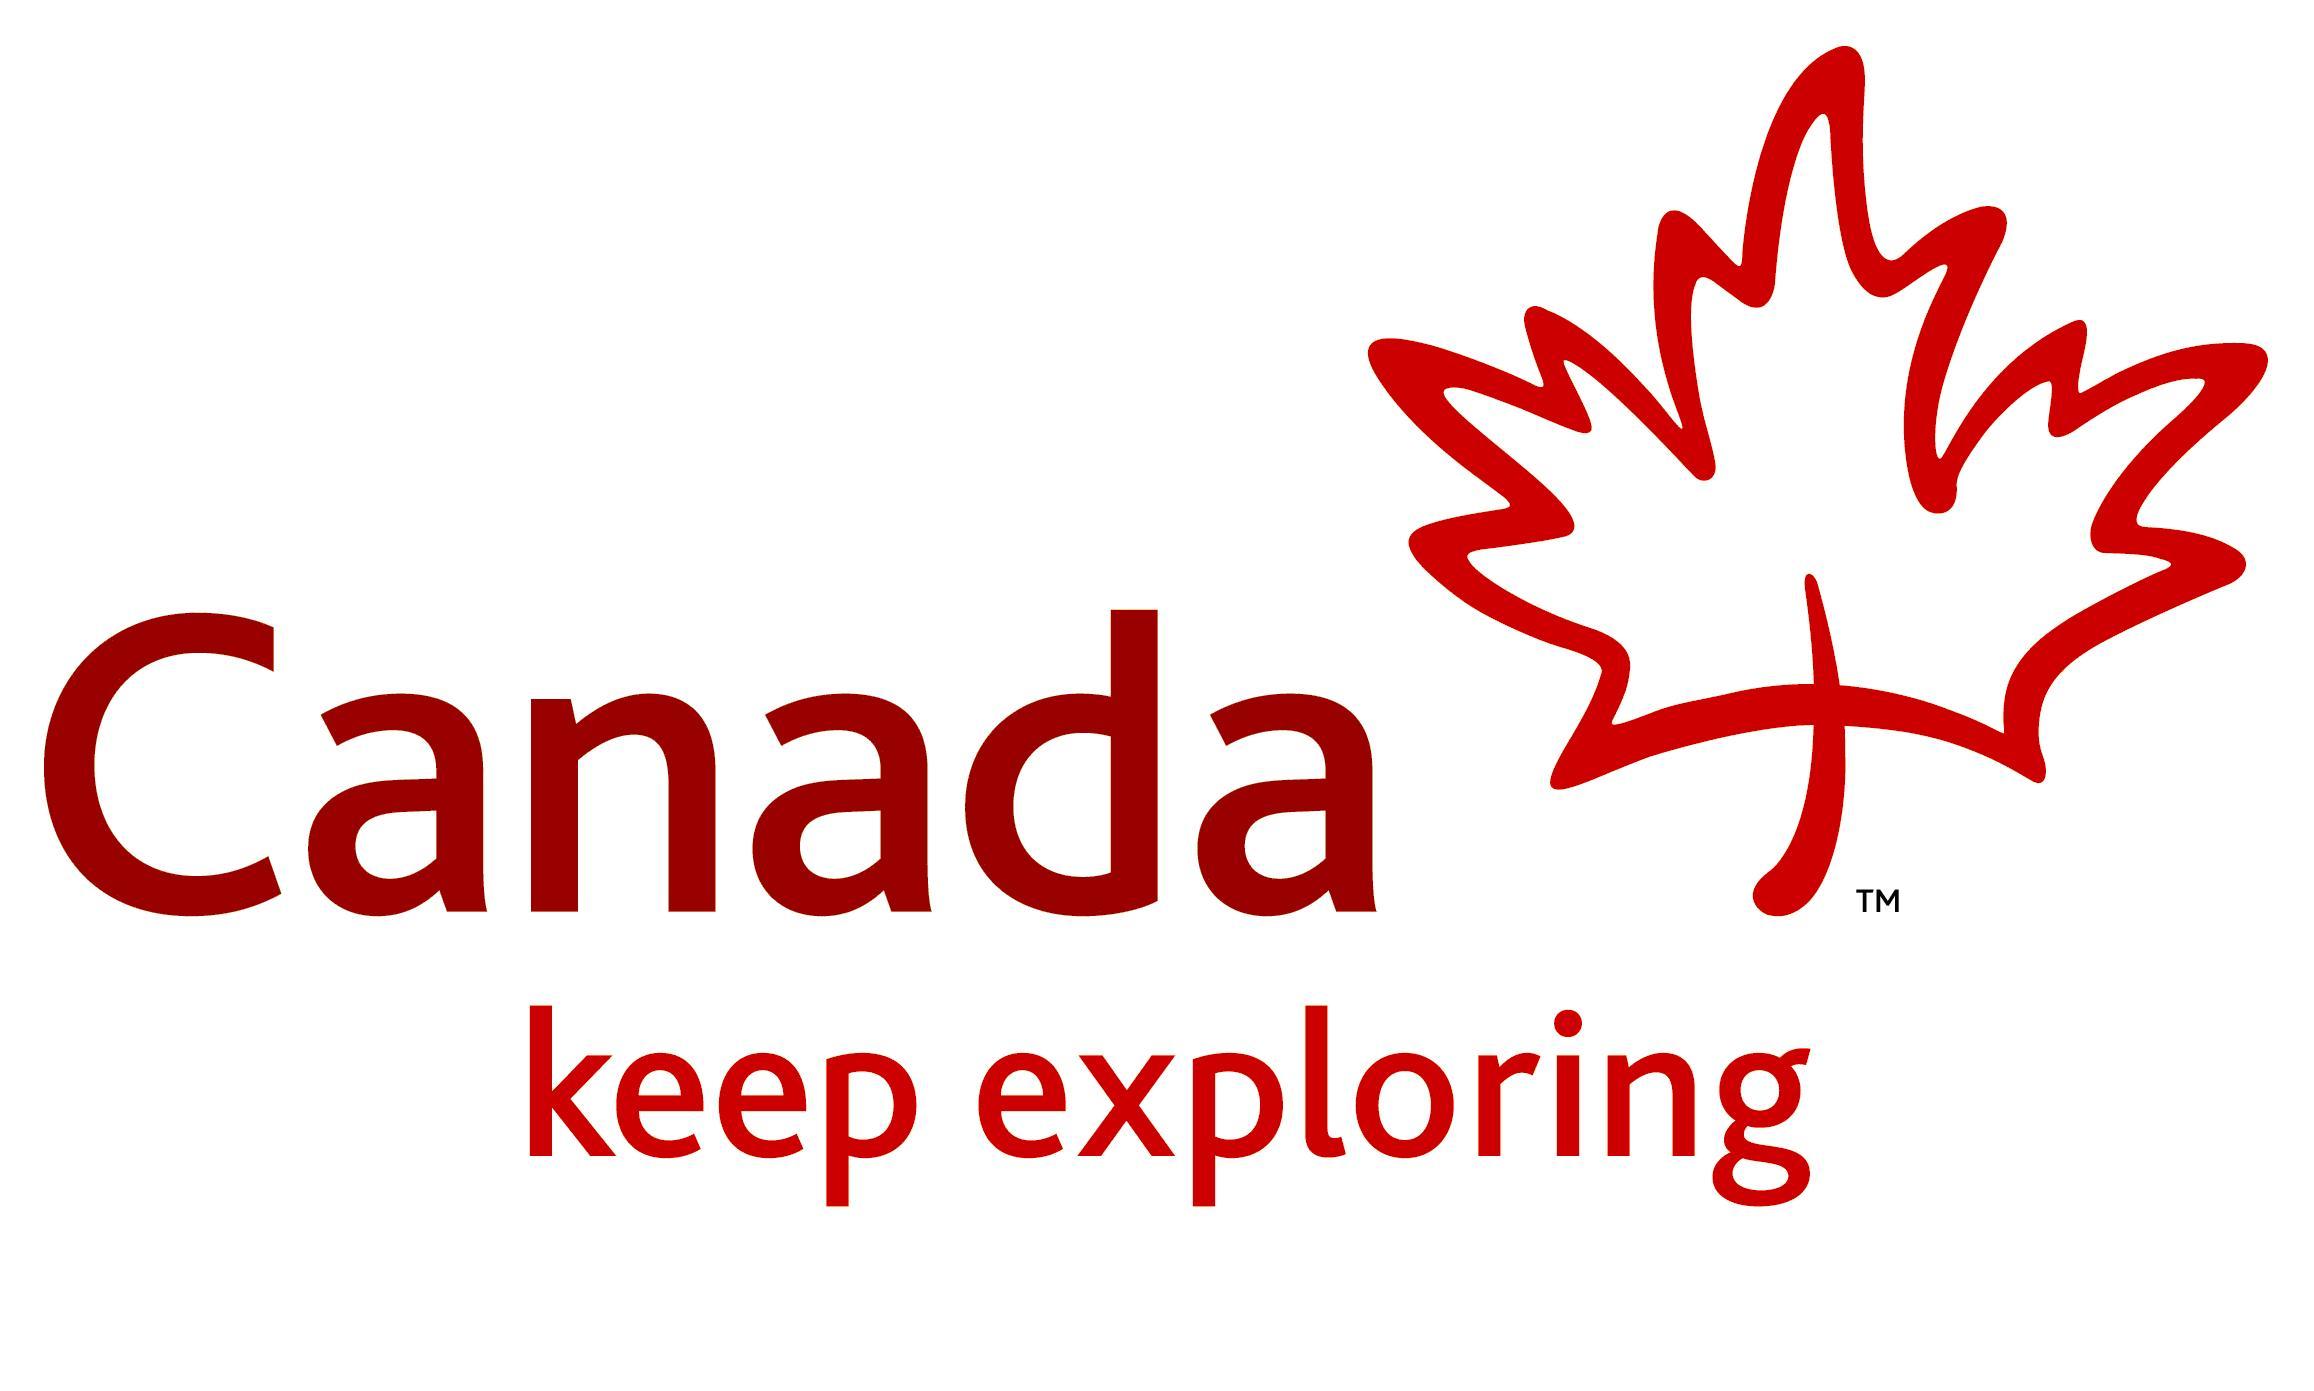 The Ex Canadian Tourism Commission